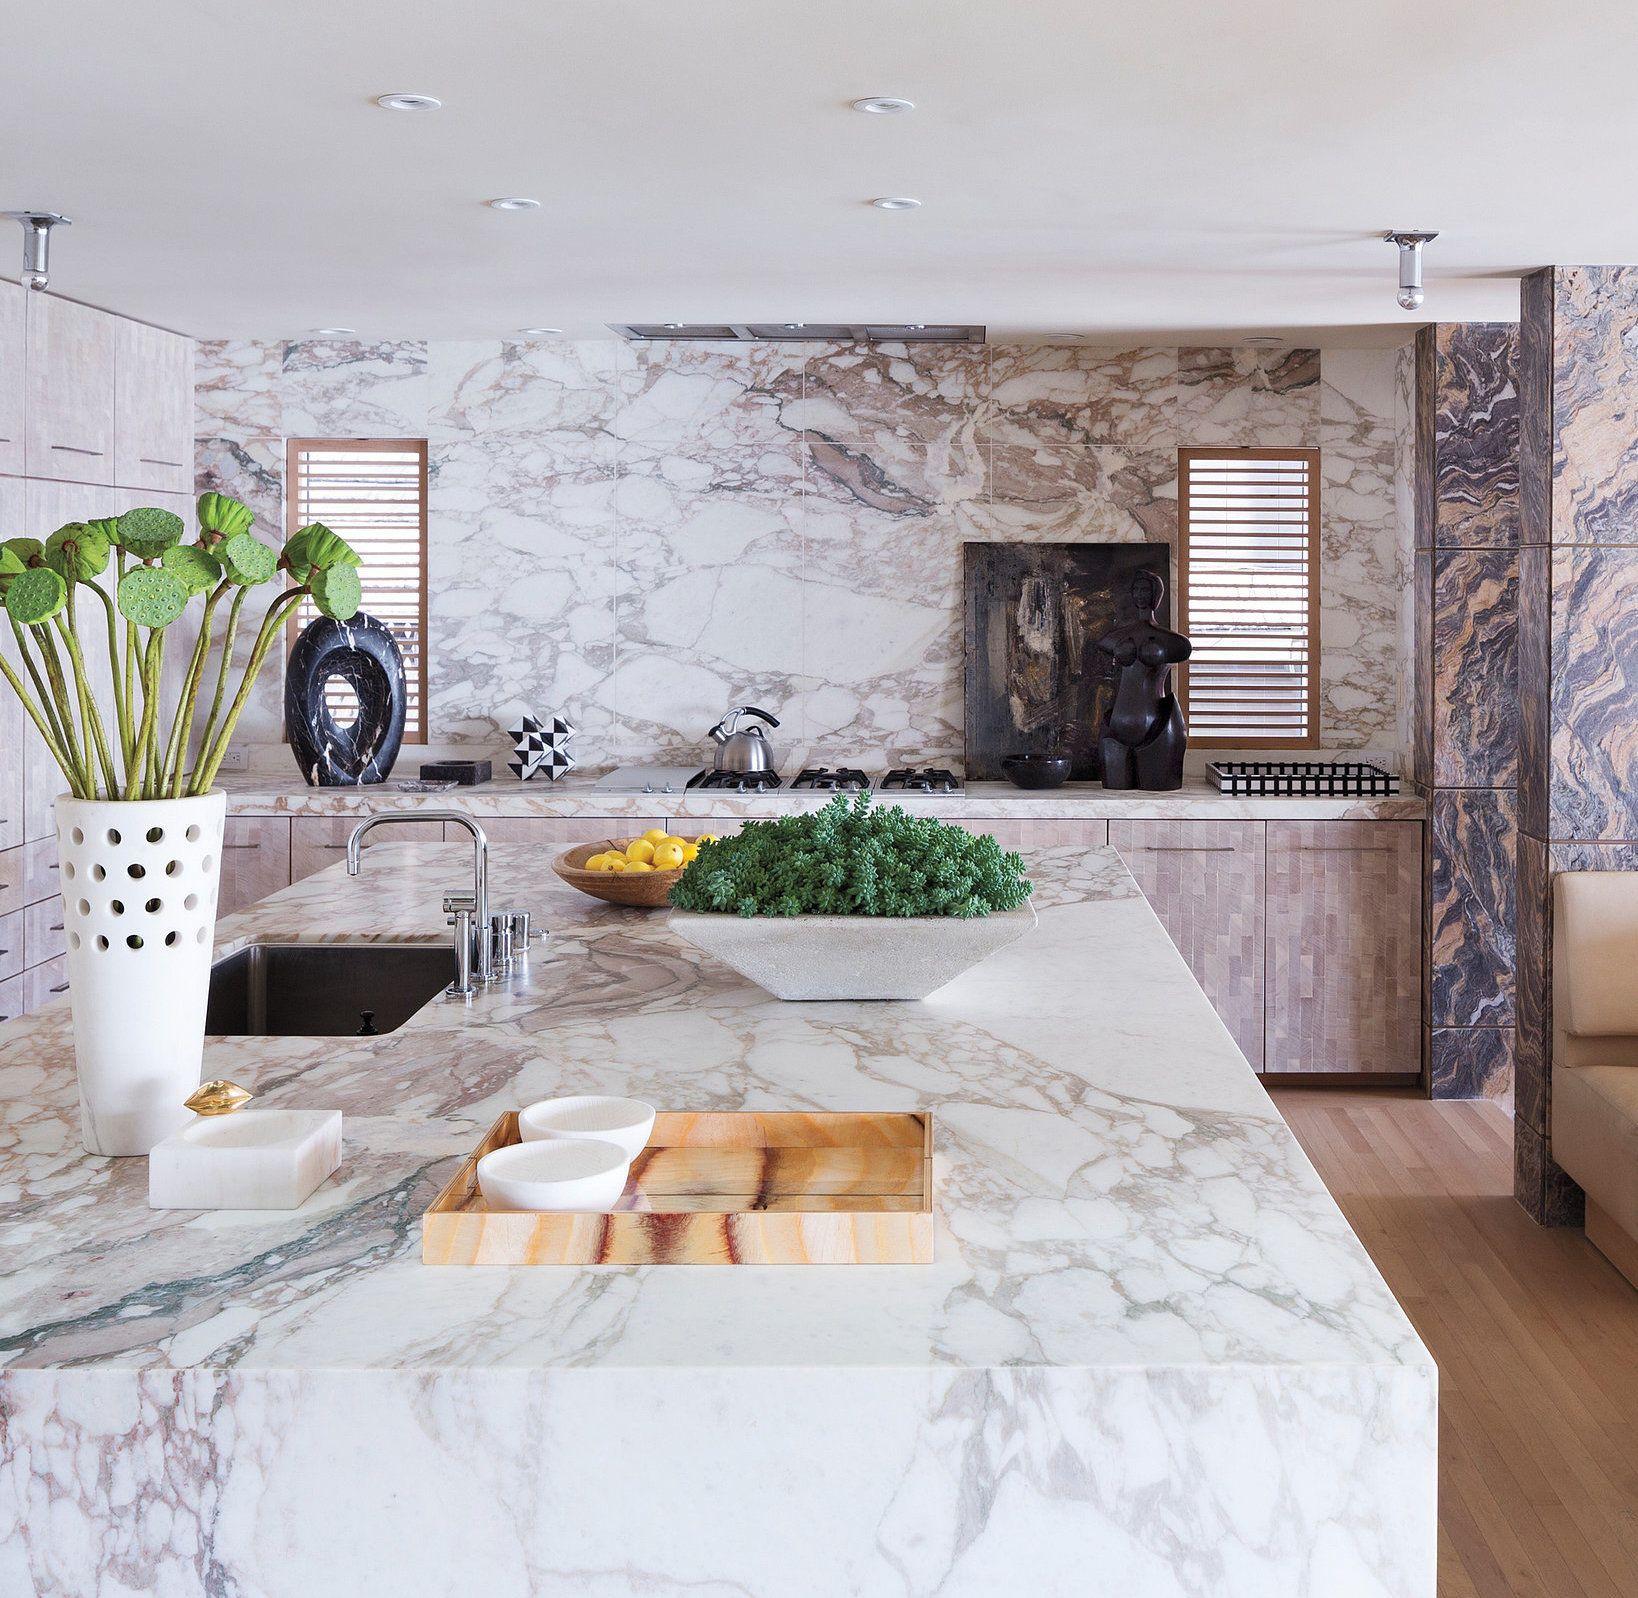 Interior Design Blog - Home Decor - Interior Design | Kelly ...